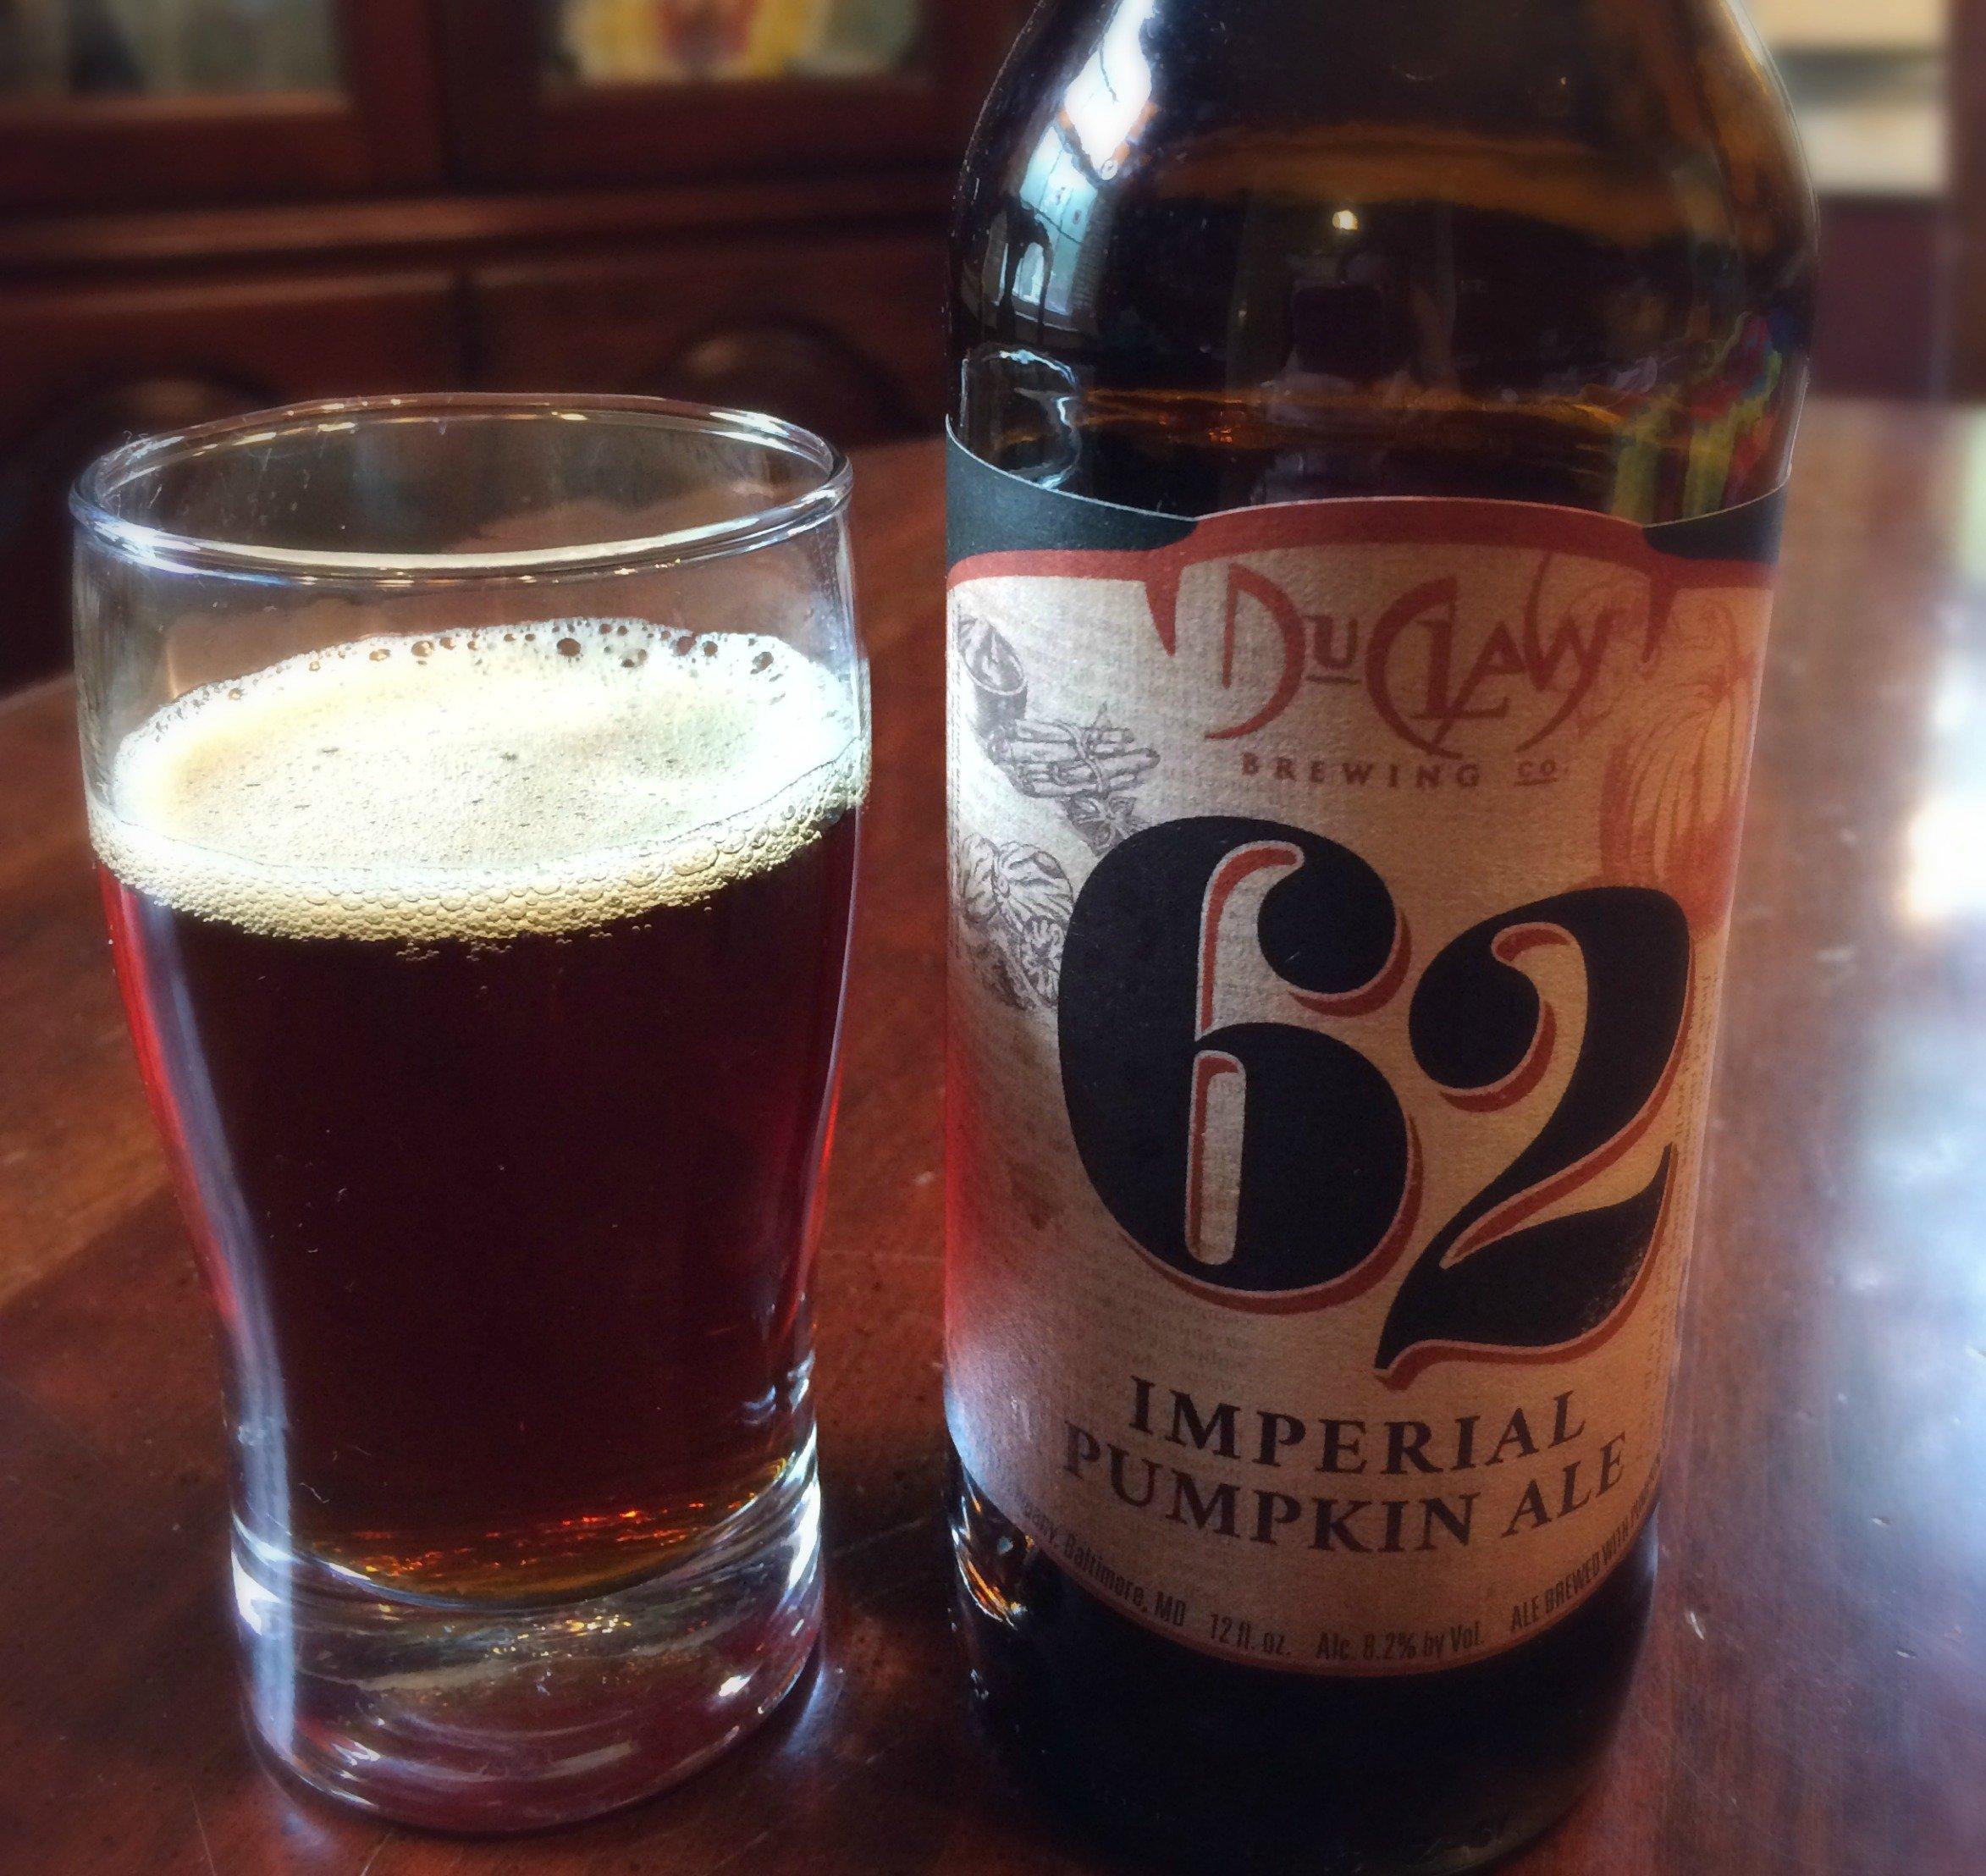 duclaw-62-imperial-pumpkin-ale